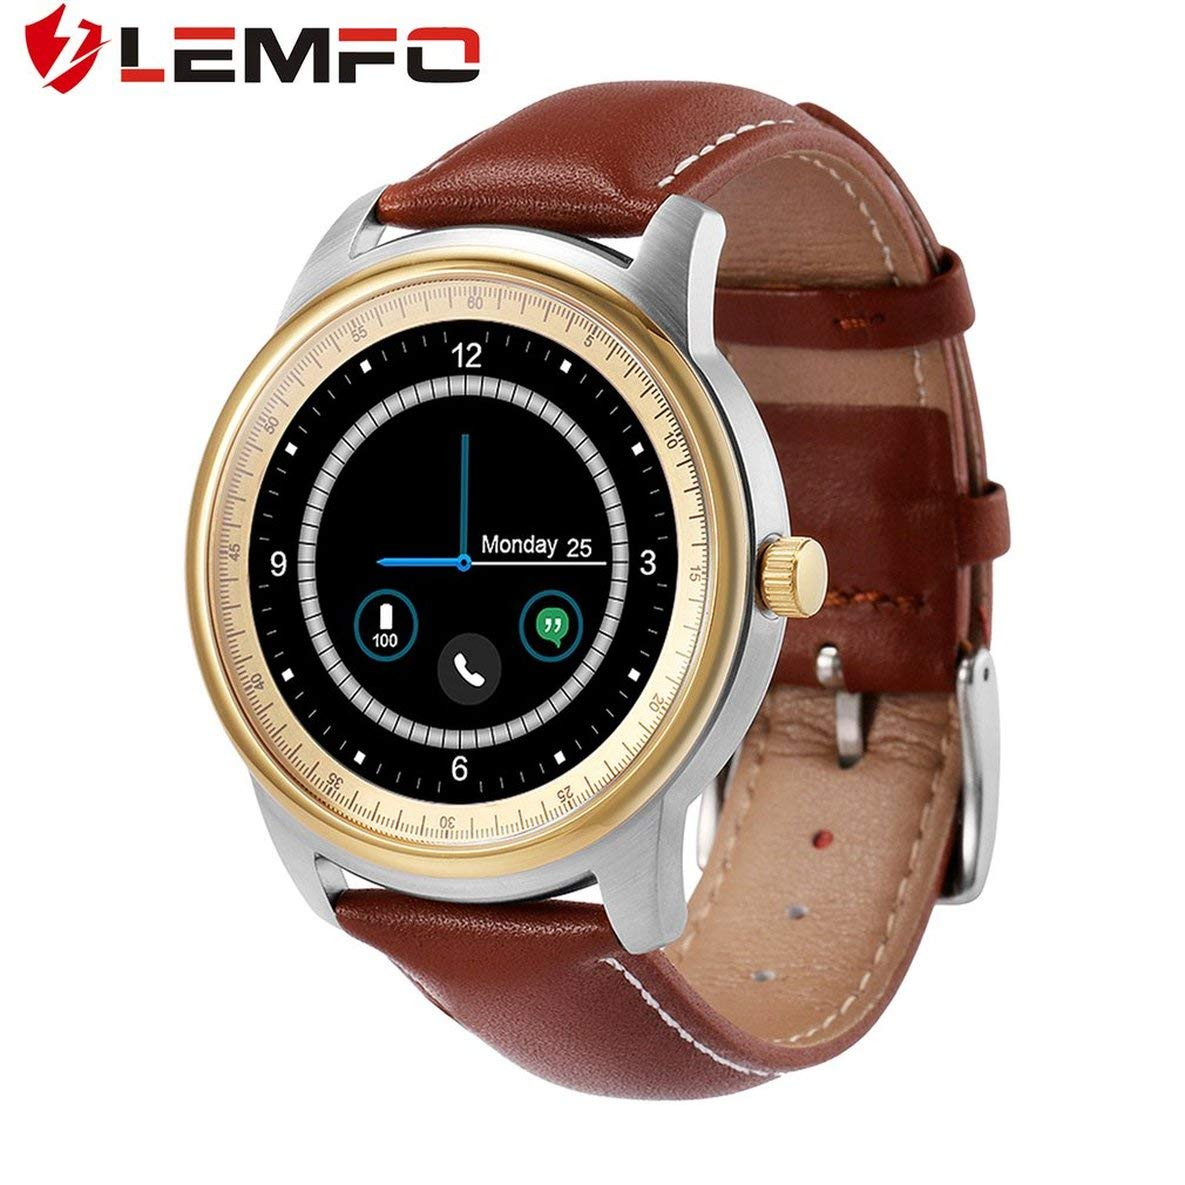 Moliies LEMFO LEM1 Schrittzähler Blautooth Armbanduhr Sync Phone Book für iOS für Android